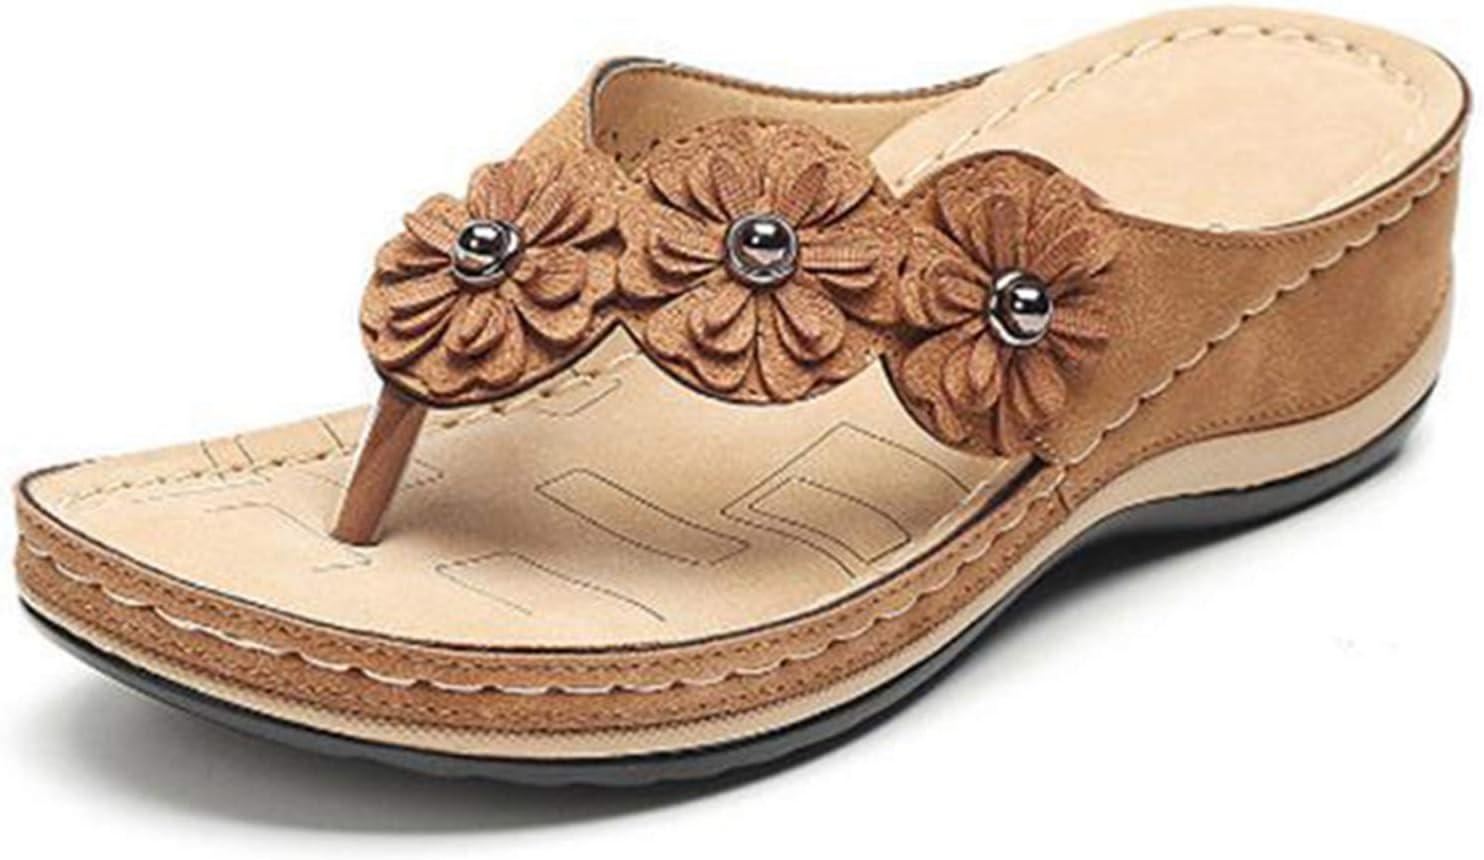 Lishiny Flower Clip Toe Beach Sandals with Rubber Sole, Women's Flip Flops Outdoor Slippers Bohemia Platform Dress Shoes